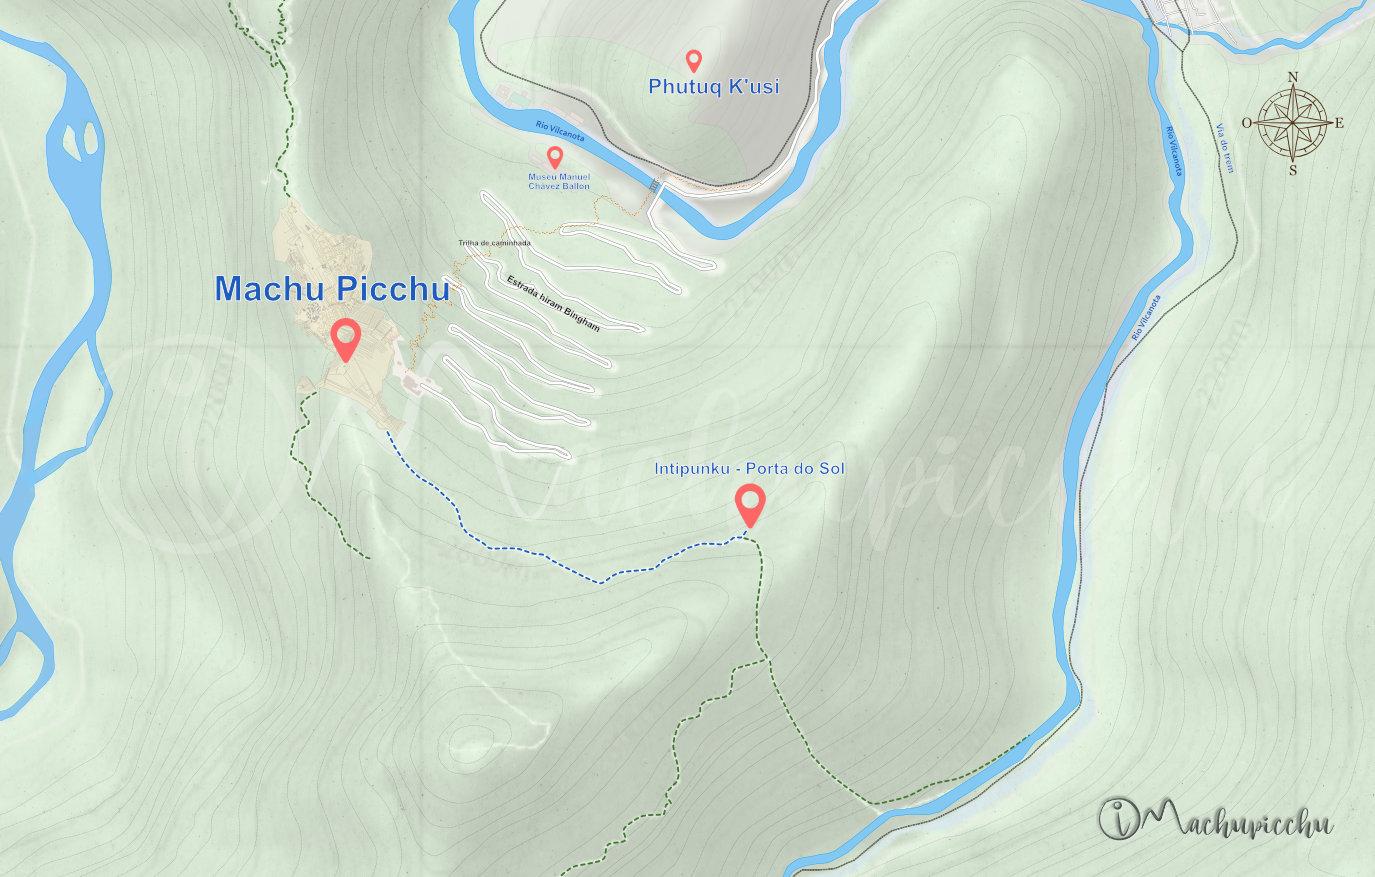 Rota Intipunku - Machu Picchu